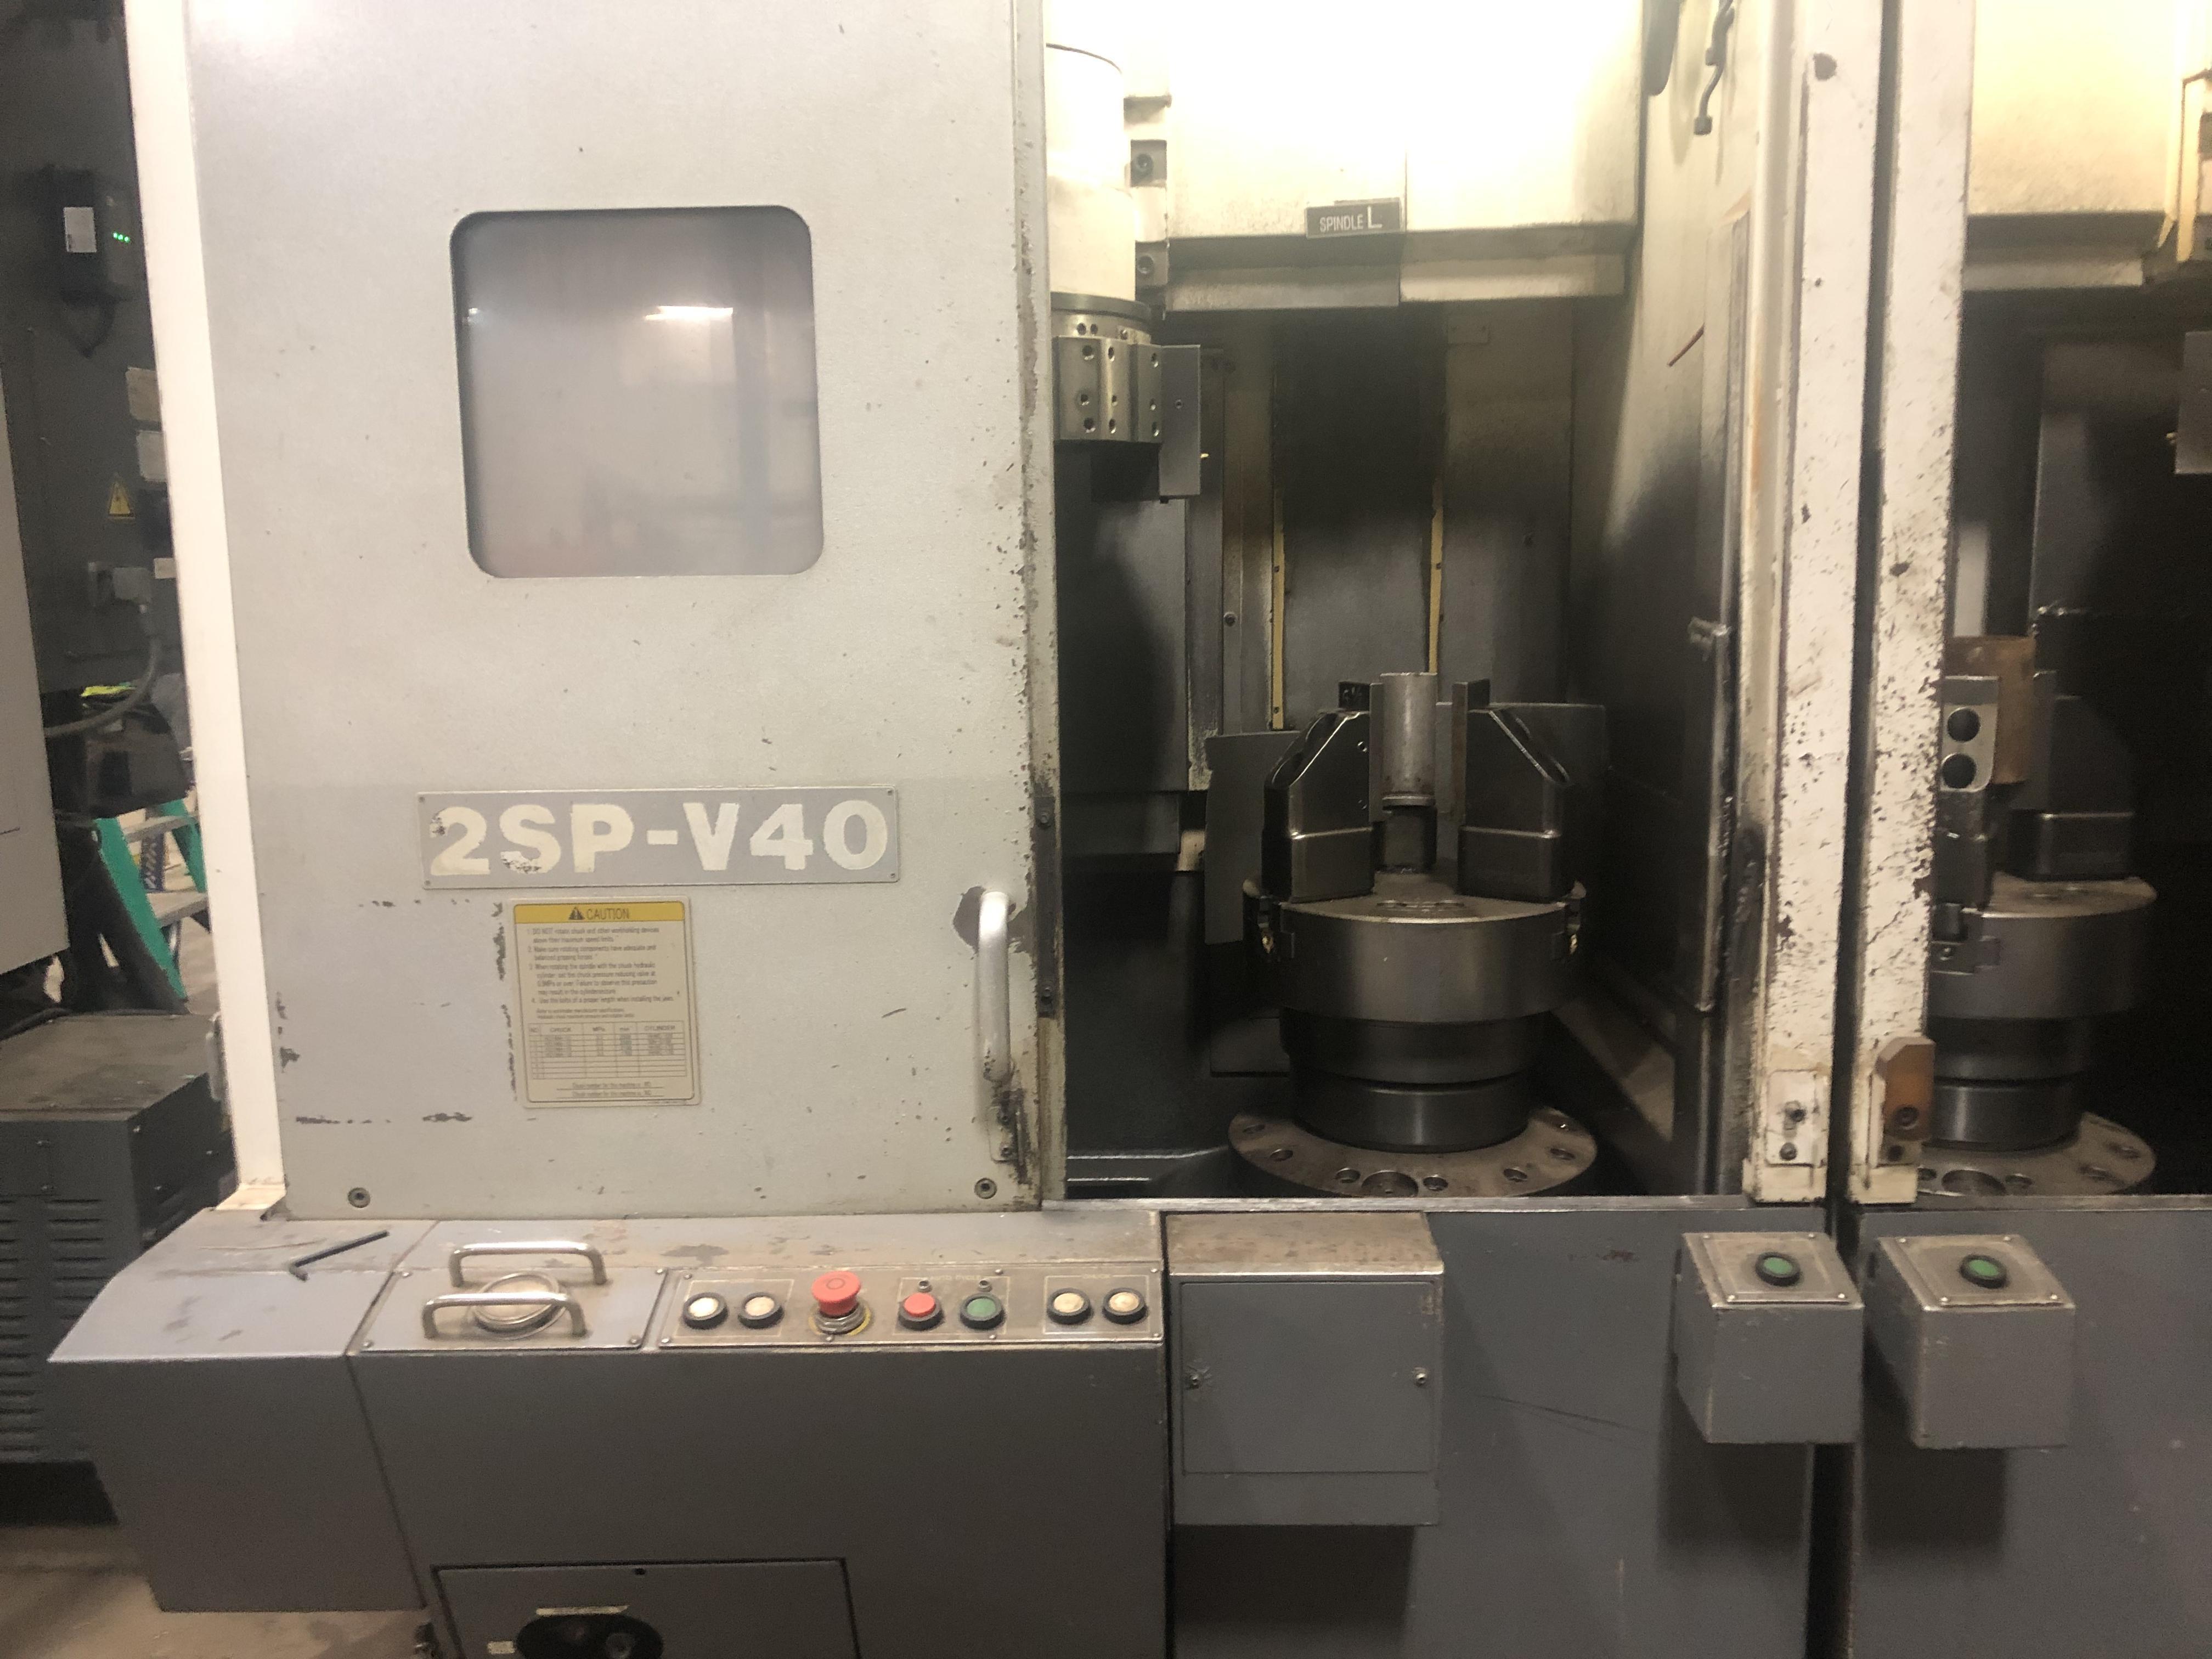 2012 Okuma 2SP-V40 - CNC Twin Spindle Vertical Turret Lathe